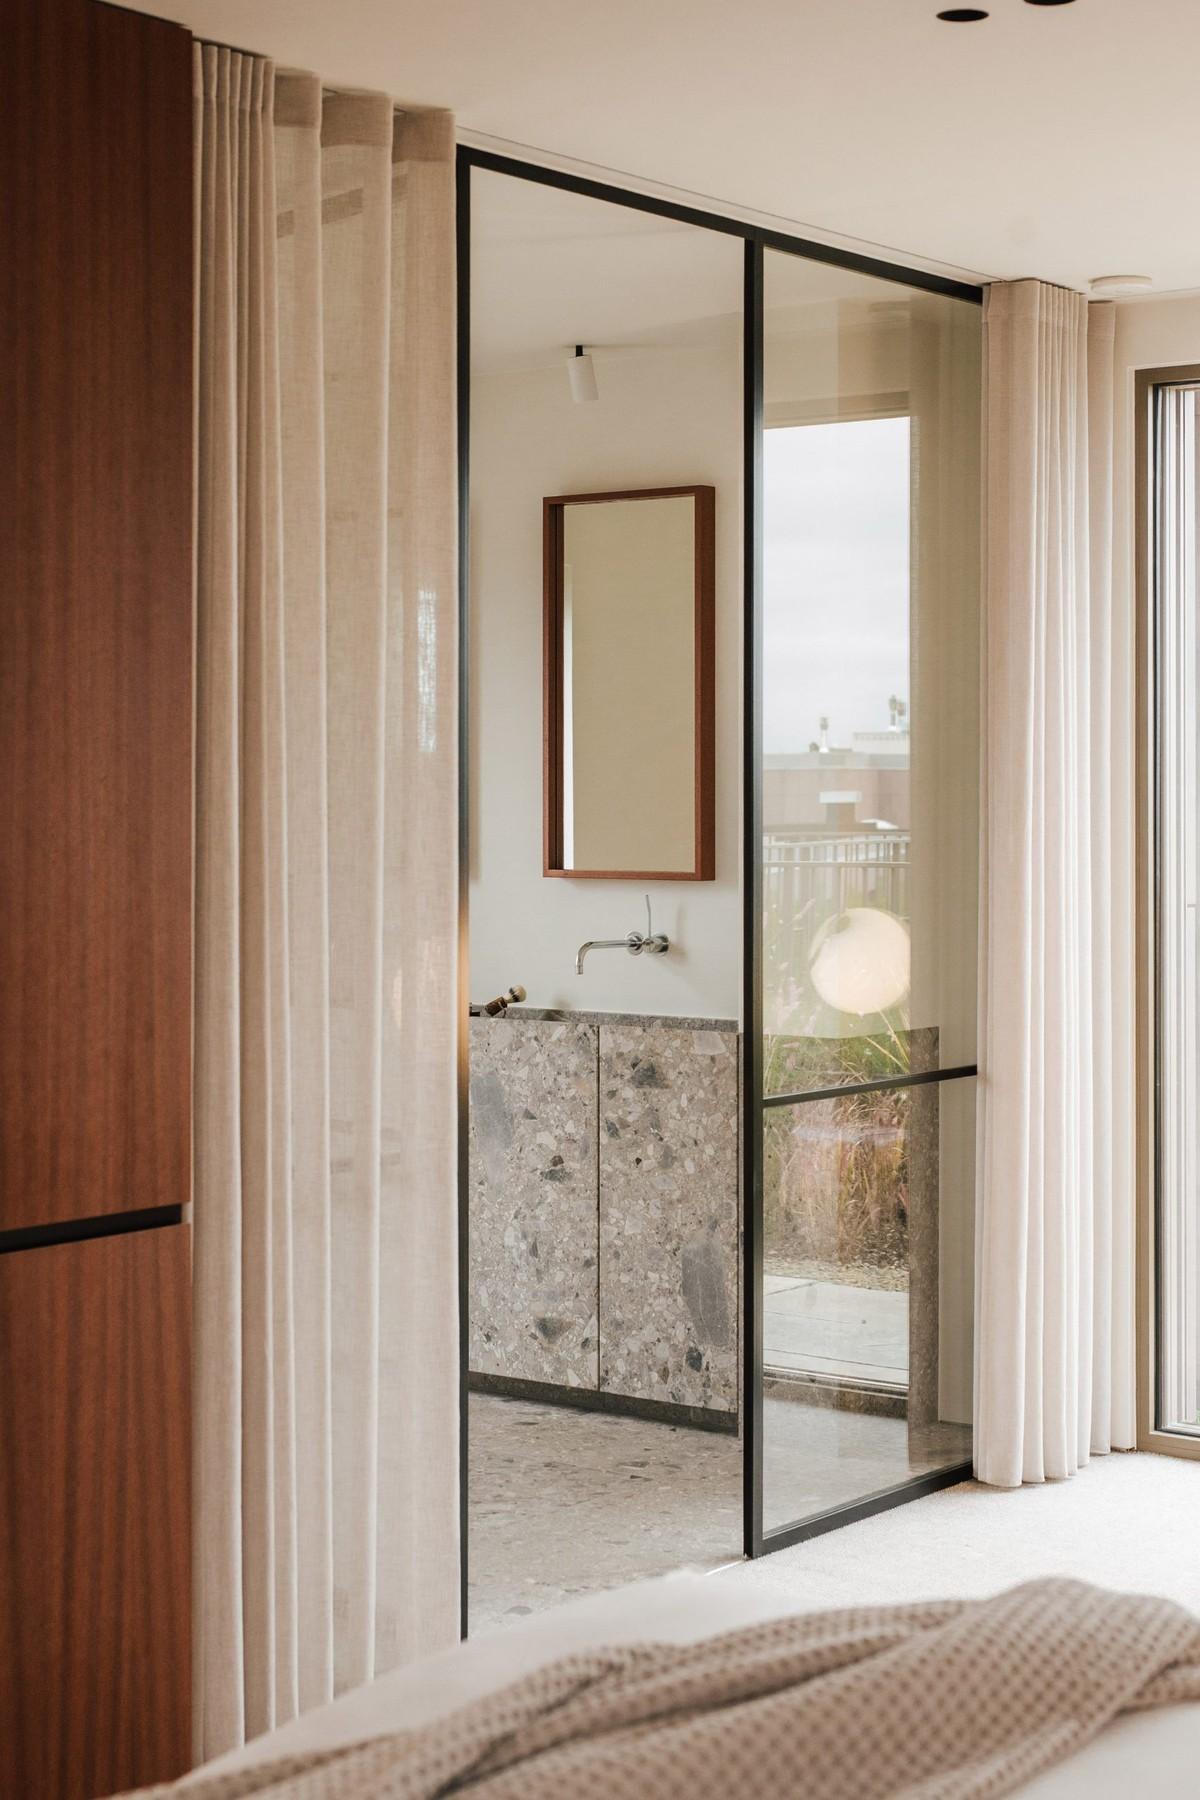 Penthouse apartment in Hasselt, Belgium (designed by Adjo Studio)